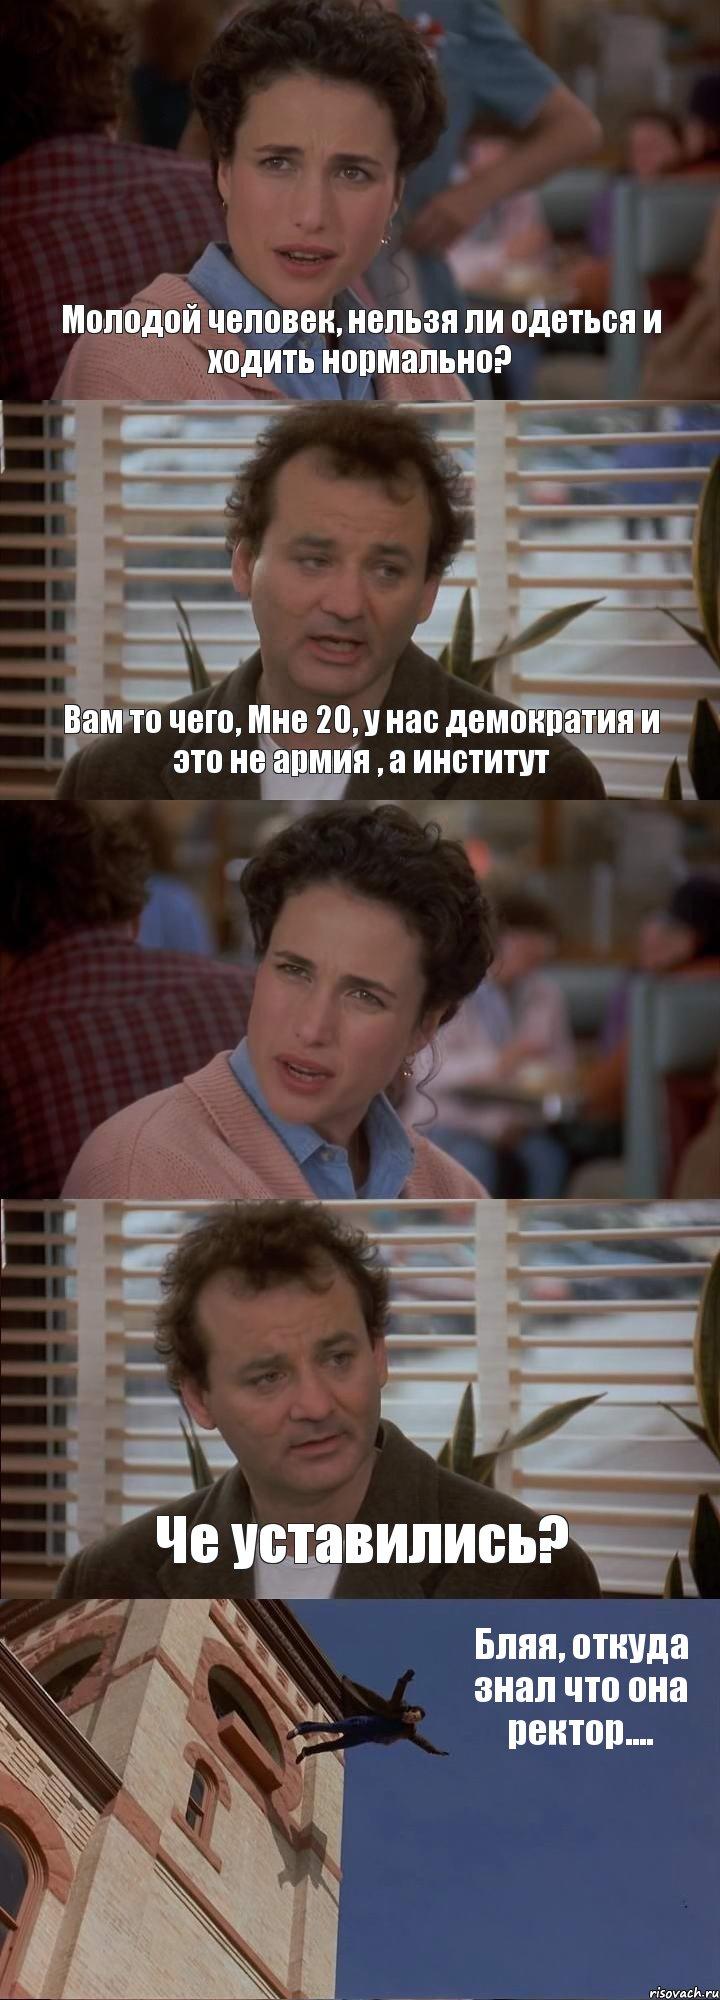 suchka-tekst